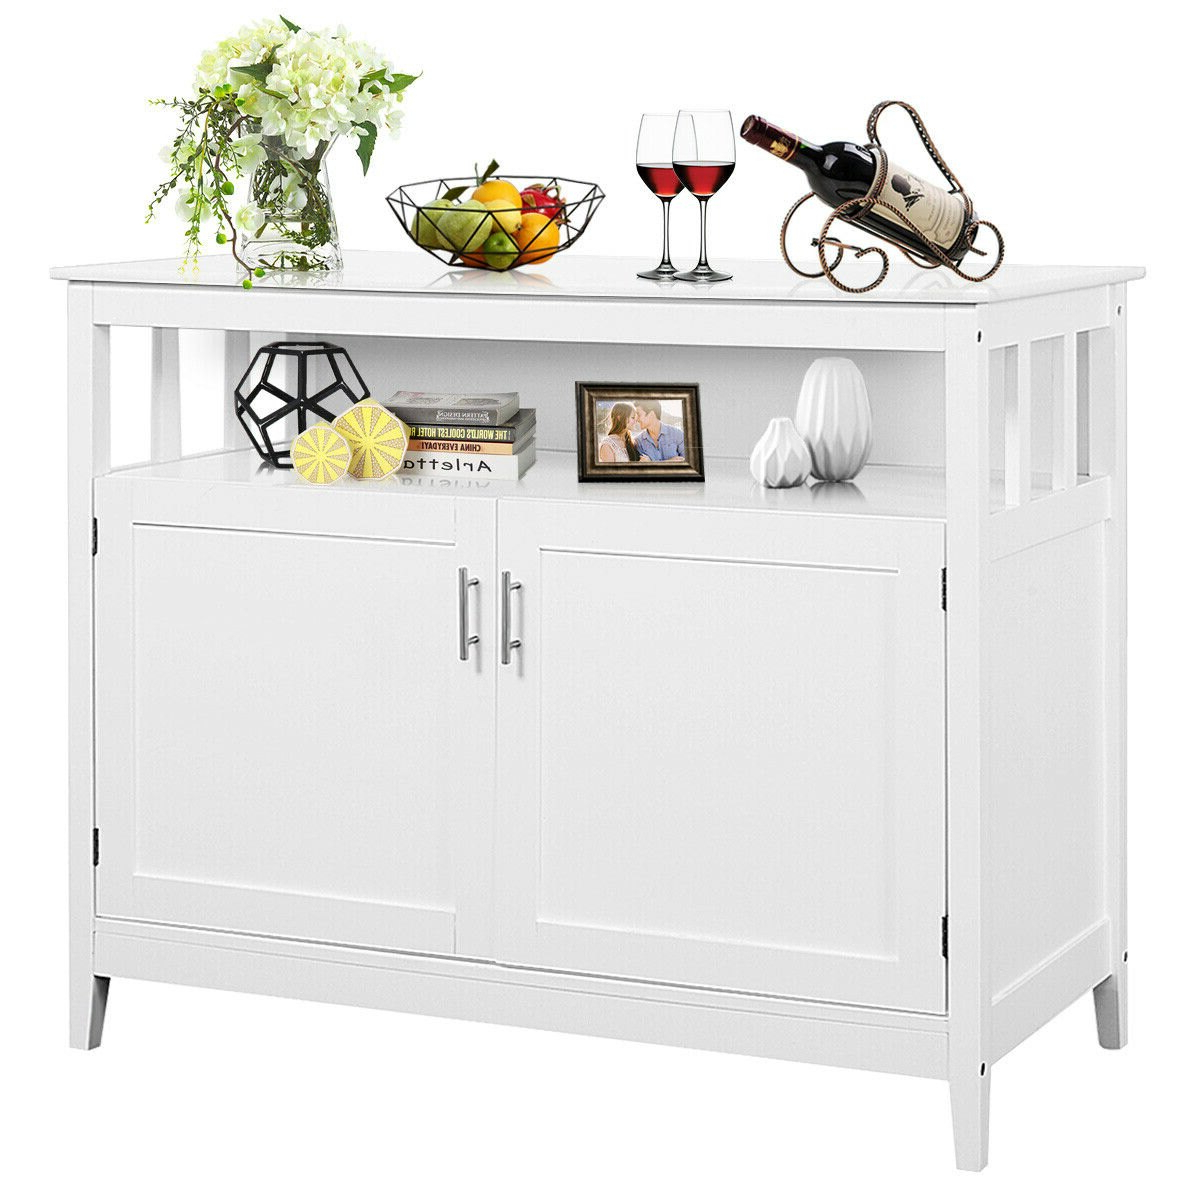 Costway: Costway Modern Kitchen Storage Cabinet Buffet Server Table  Sideboard Dining Wood White | Rakuten With Regard To Modern Espresso Storage Buffets (View 3 of 20)